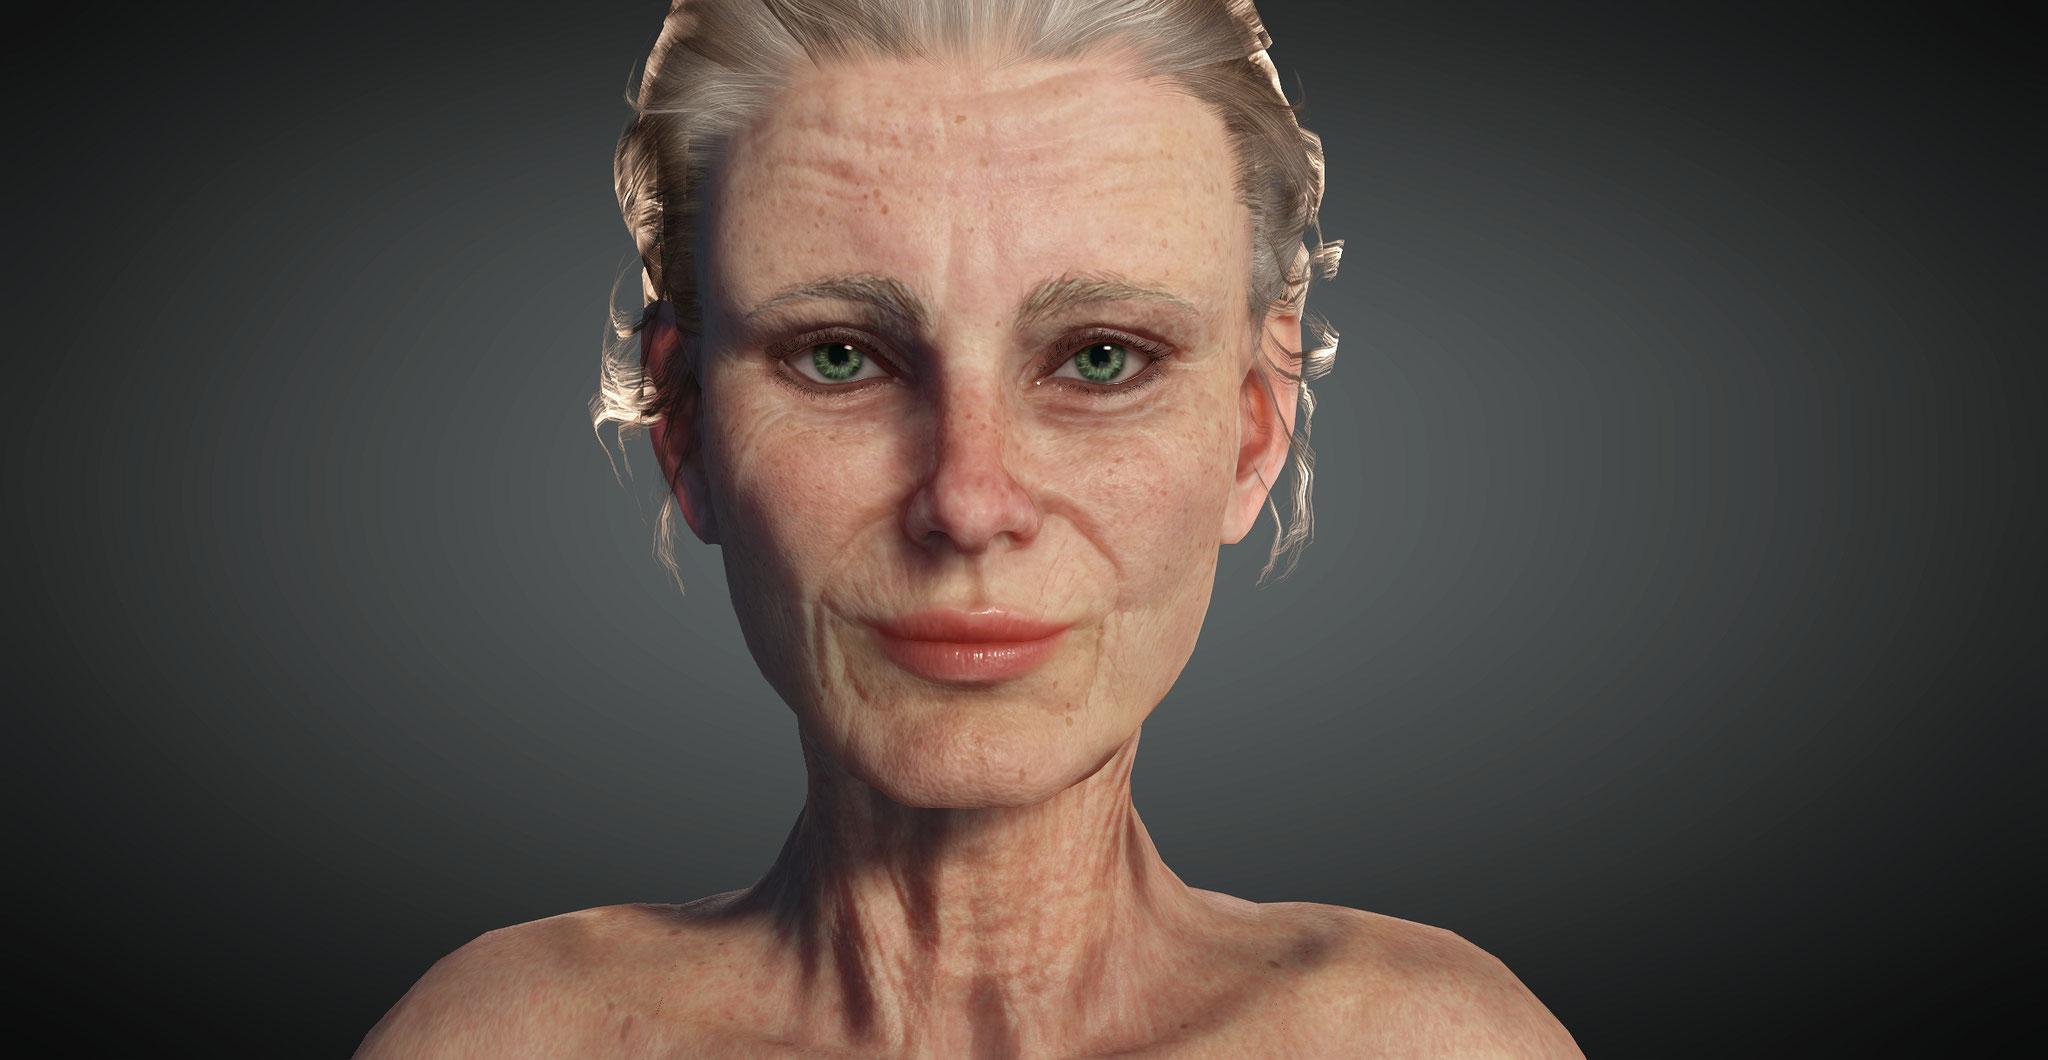 Lucy, 60 jährig